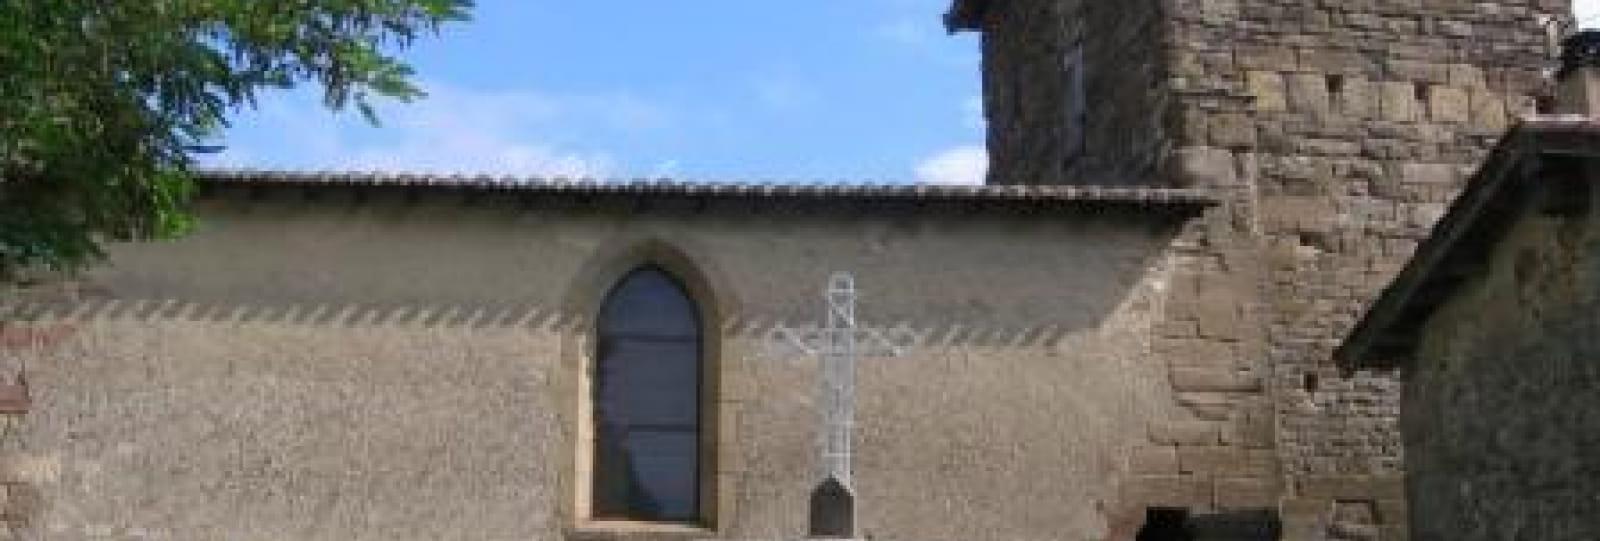 Eglise Saint-Ange de Peyrins